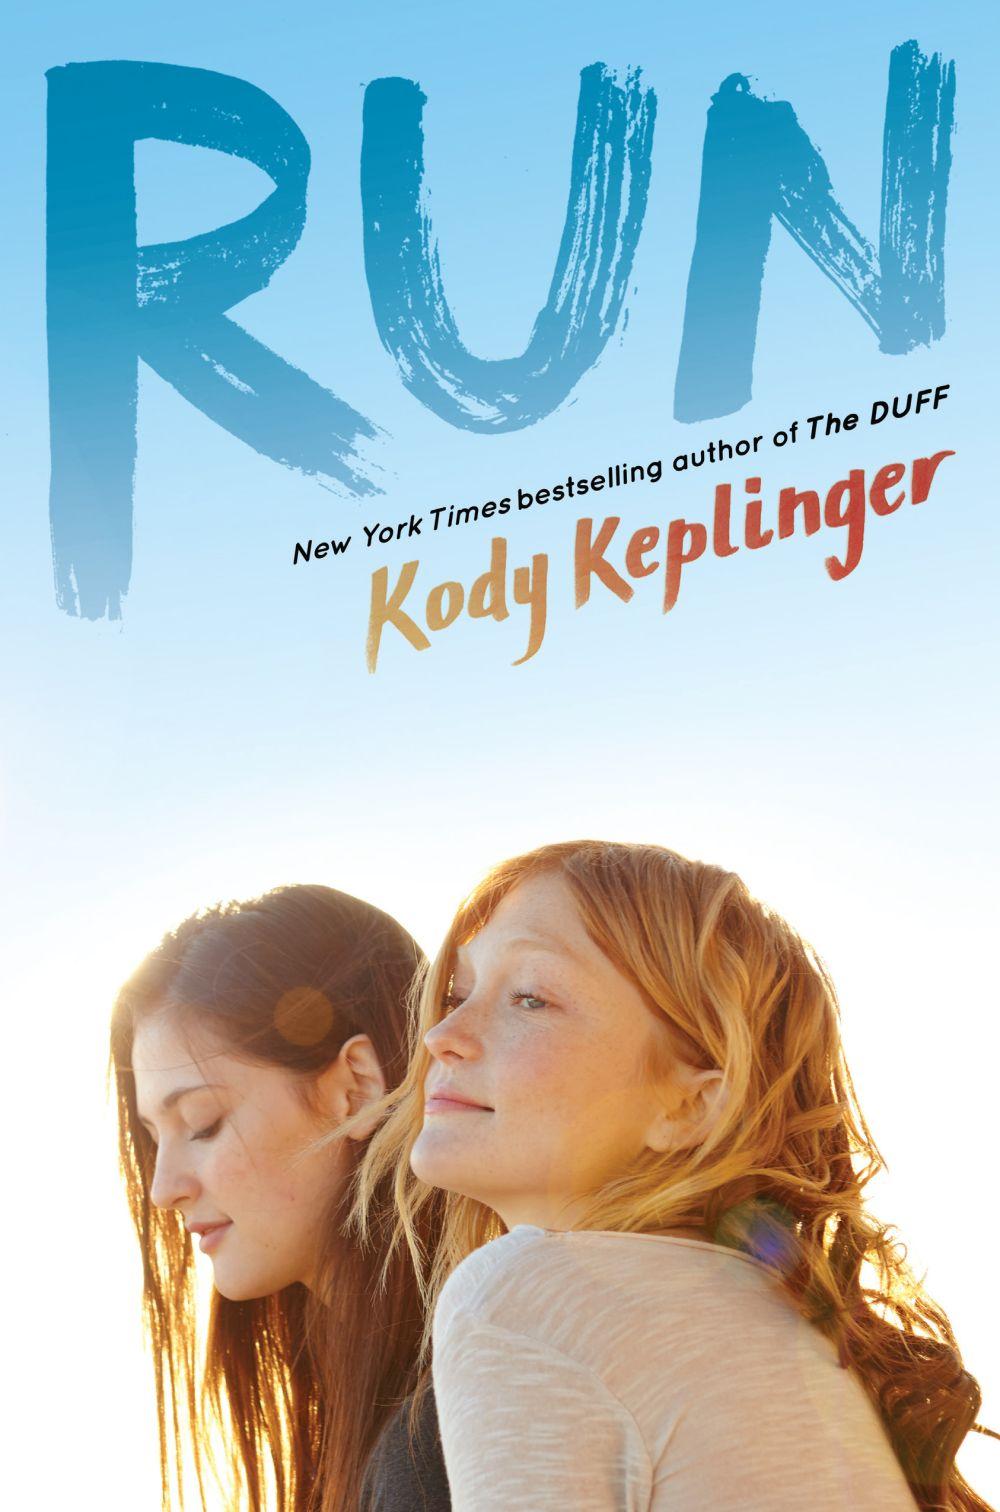 Mother-daughter relationships in YA: Run by Kody Keplinger